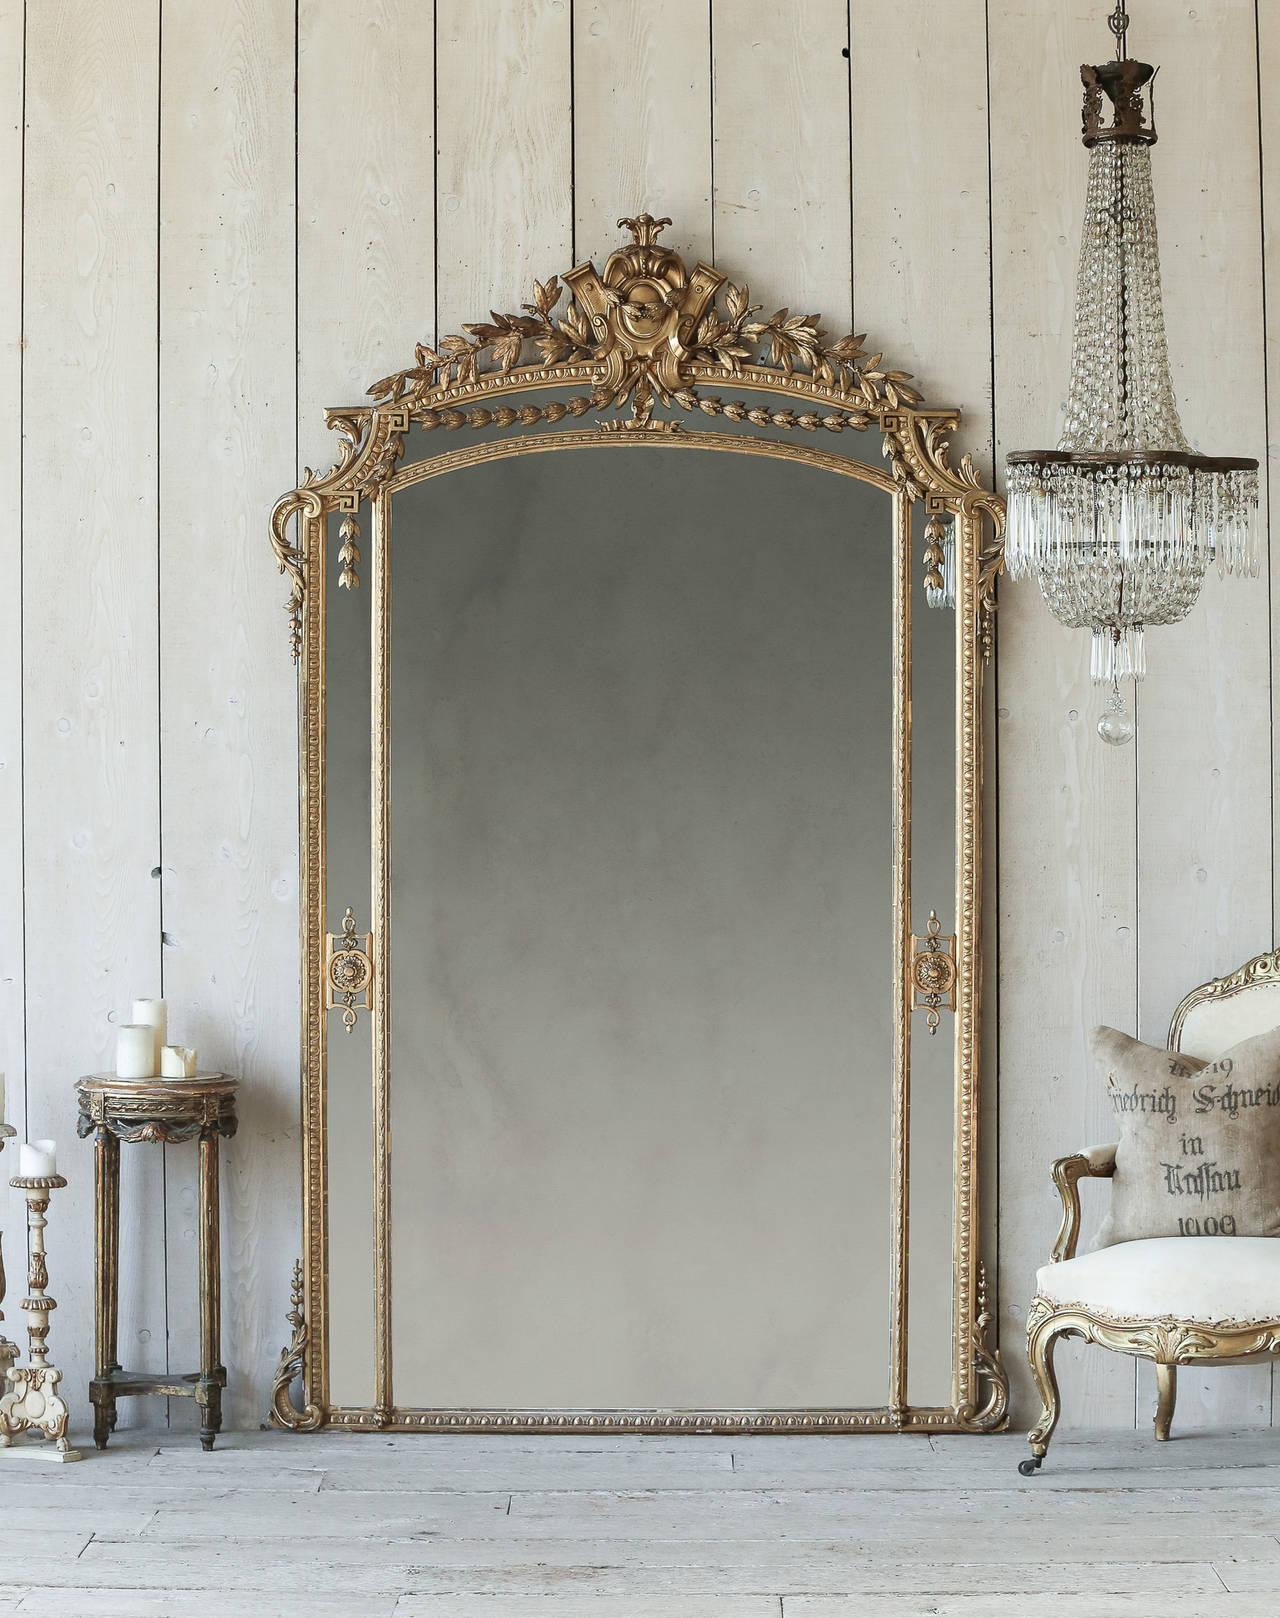 Antique french pareclose ballroom mirror circa 1880 at for Antique french mirror